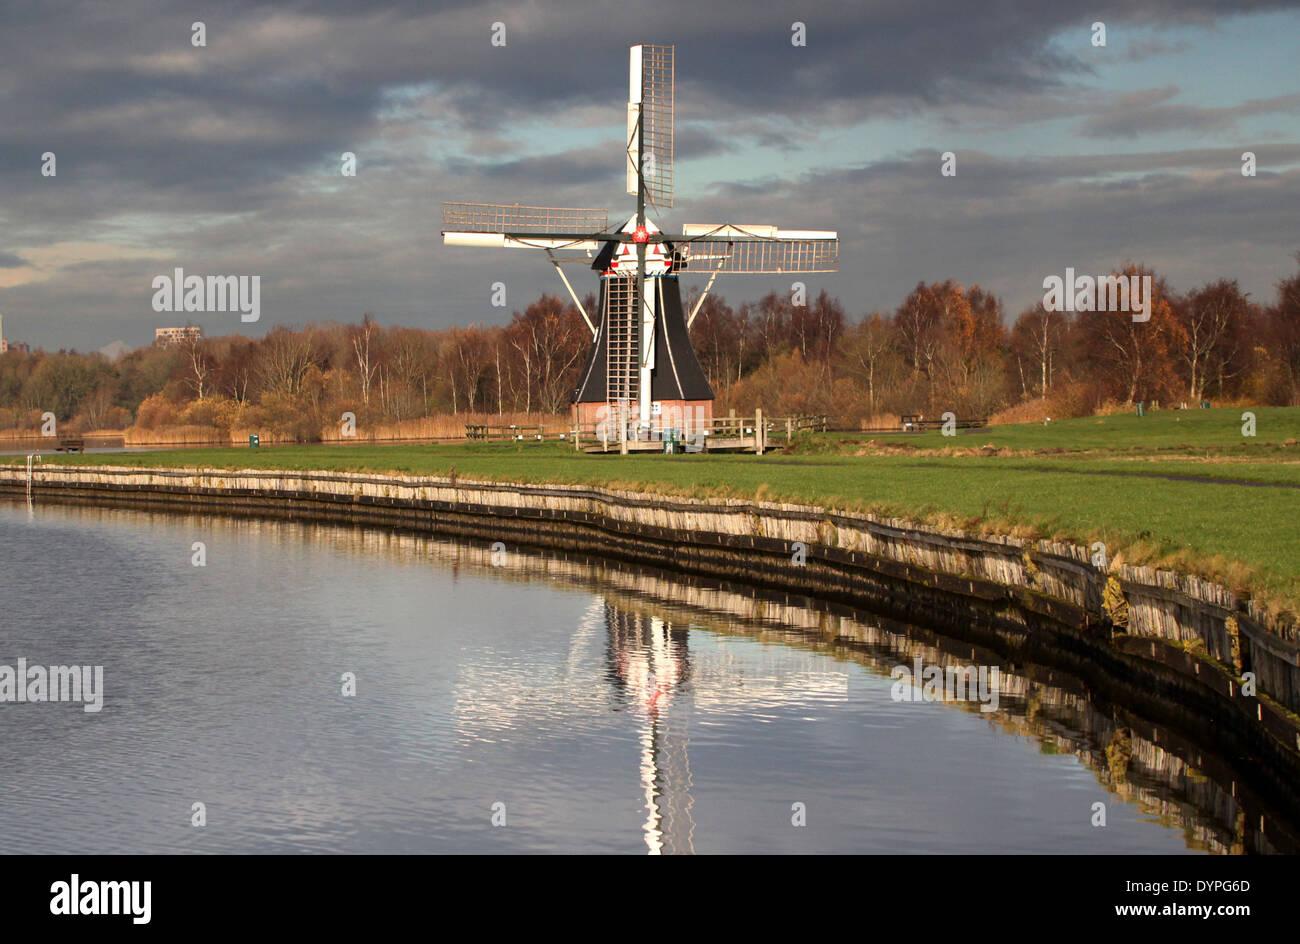 Polder Mill 'De Helper' in Haren,  Groningen, Netherlands, located  on Lake Paterswolde - Stock Image